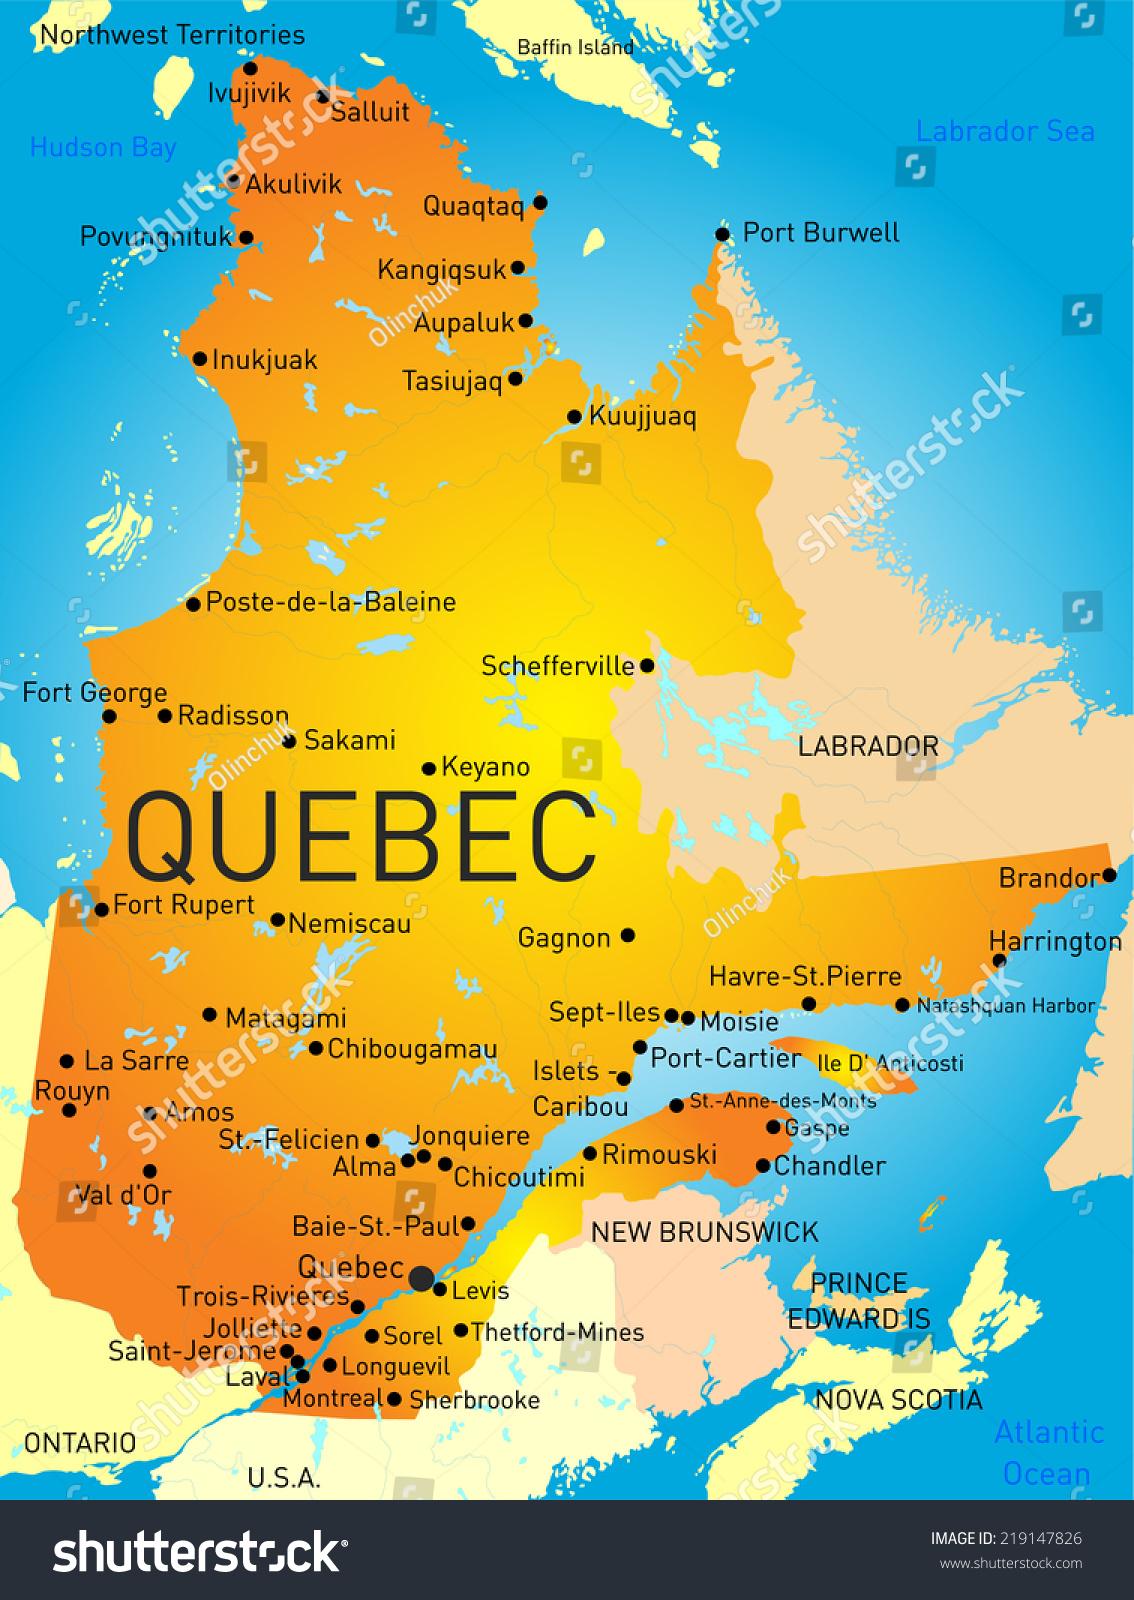 French 3 Le Qubec Lessons Tes Teach